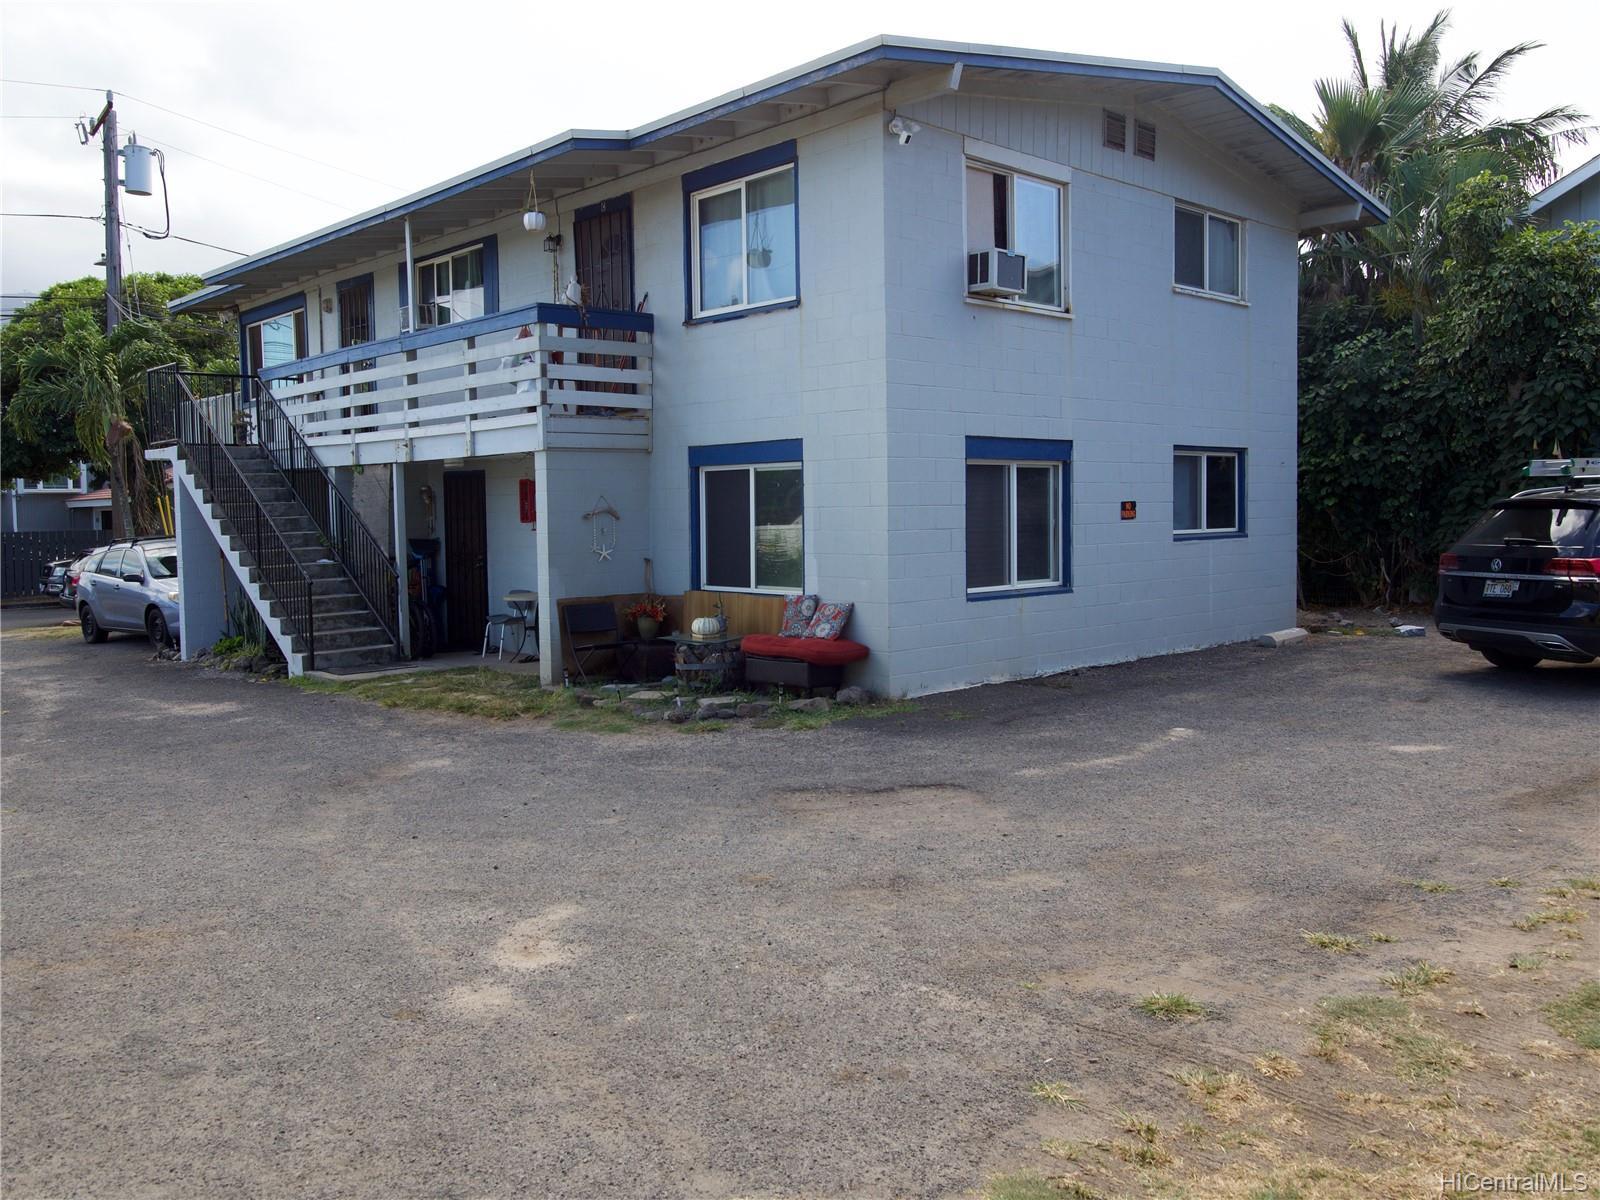 68-065 Akule Street Waialua - Multi-family - photo 1 of 15